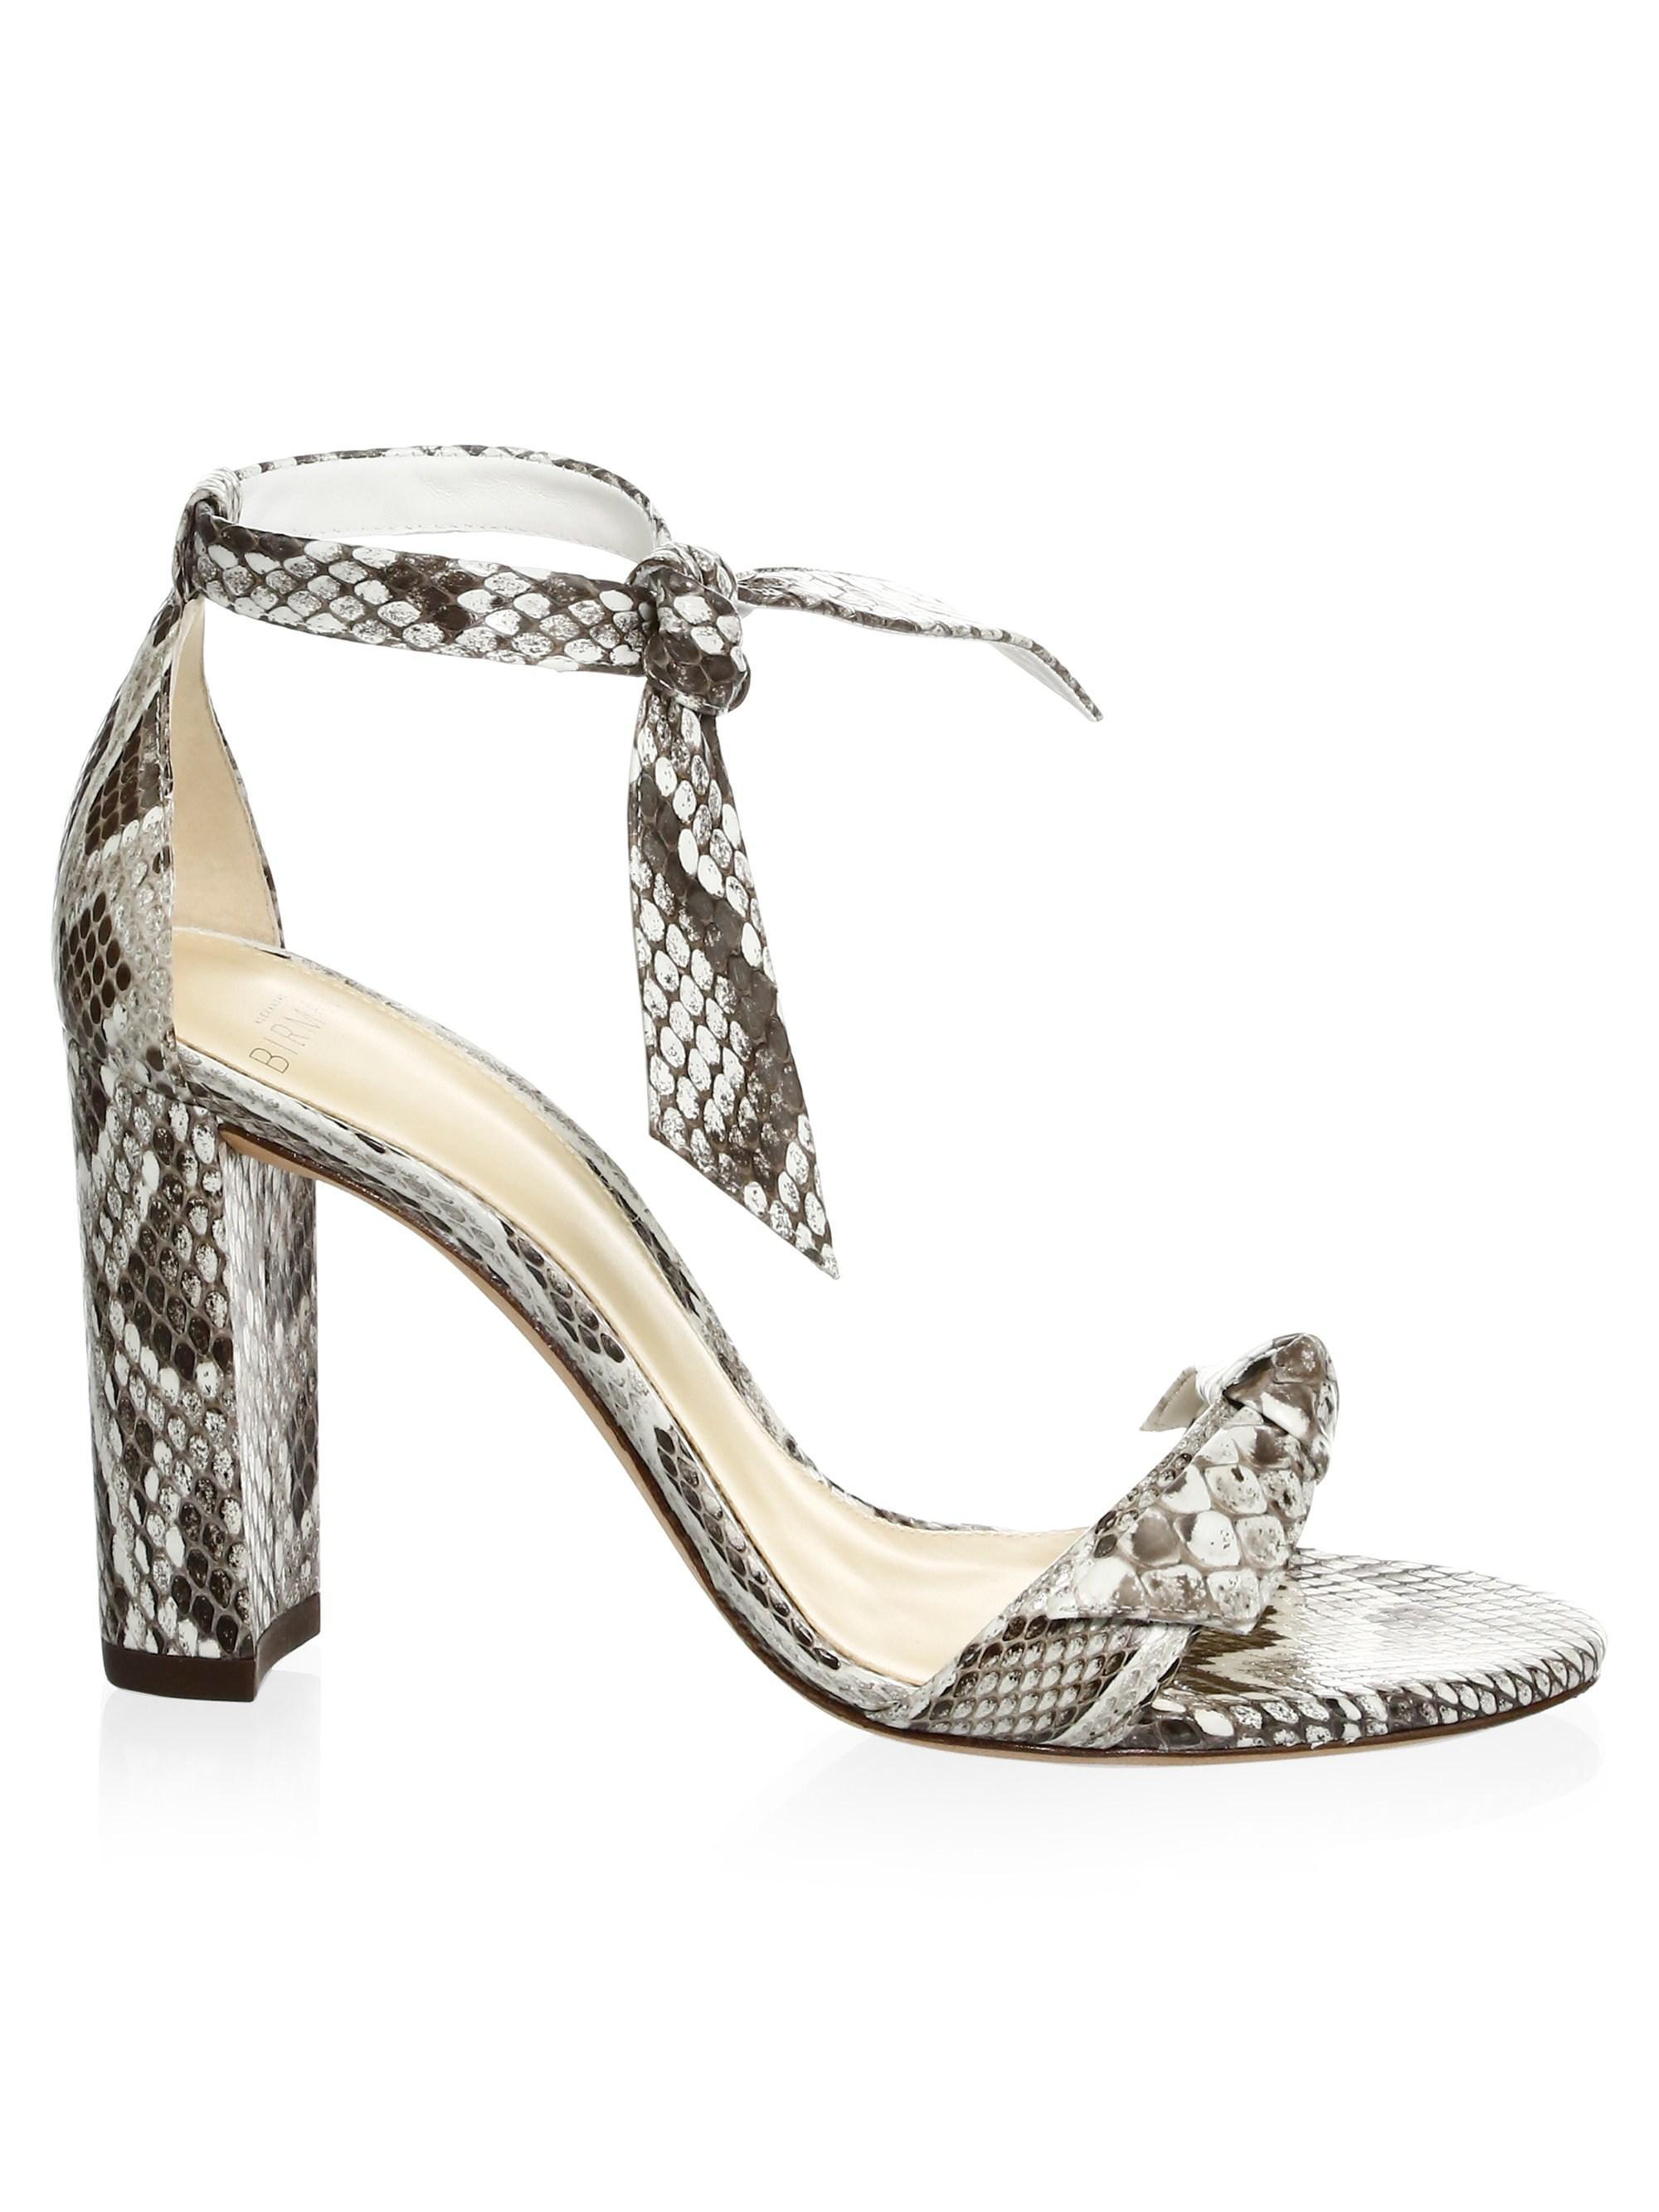 cab59b7d2555 Lyst - Alexandre Birman Clarita Python Block Heel Platform Sandals ...